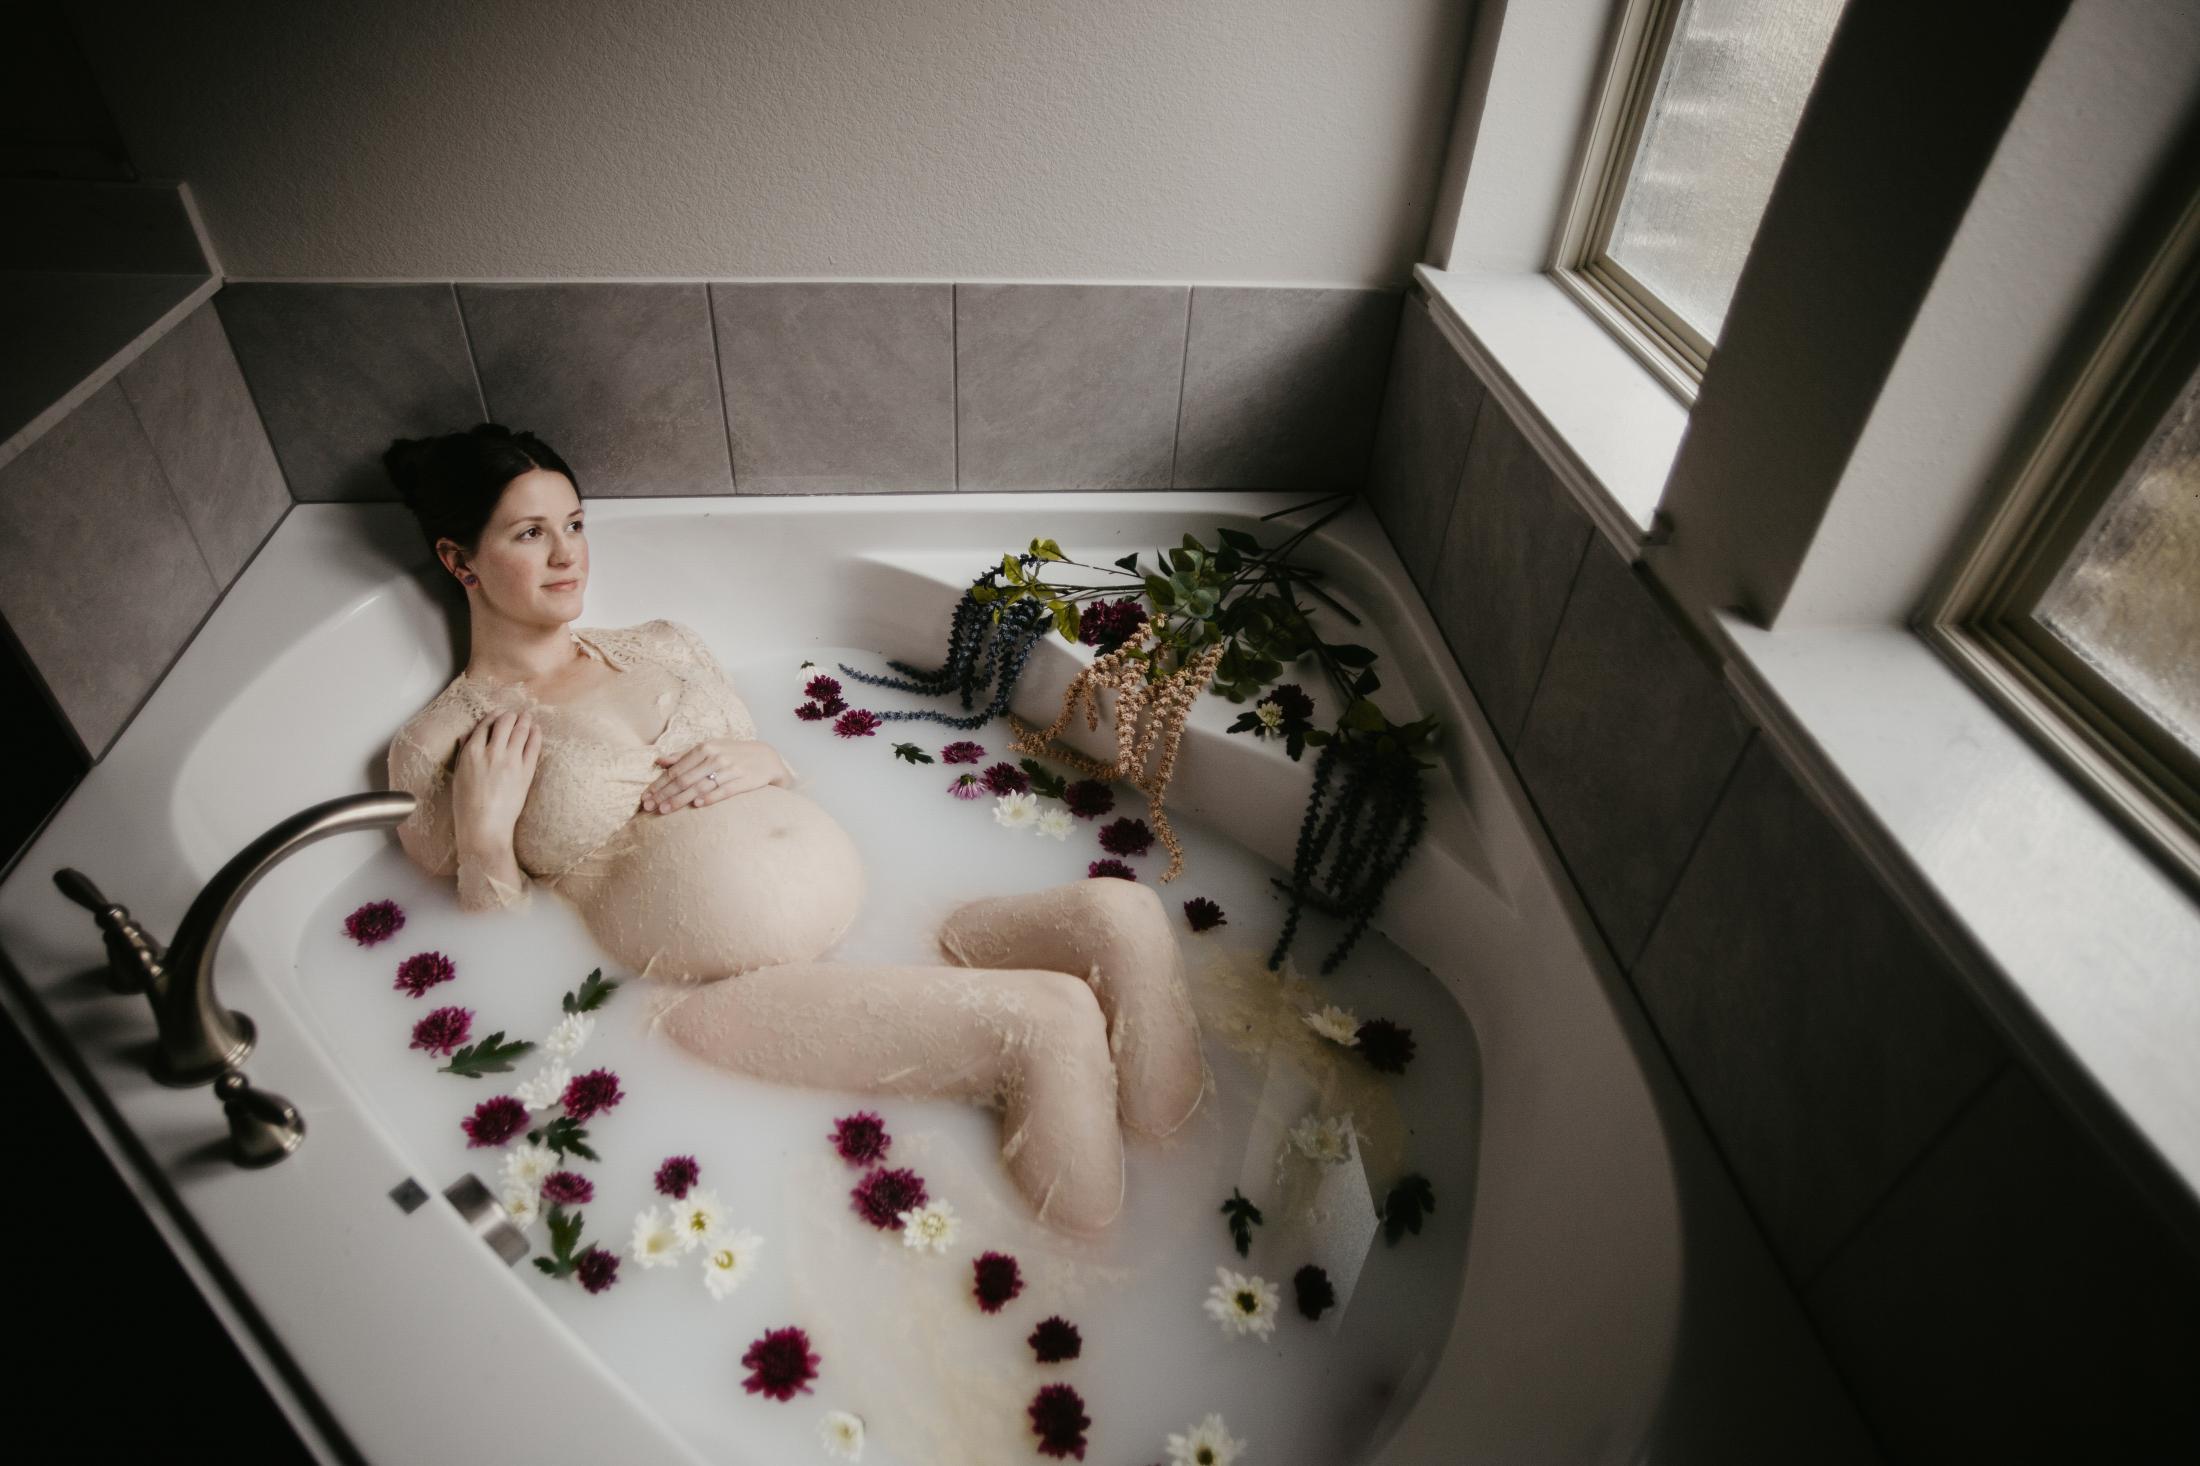 A milk bath set photograph.